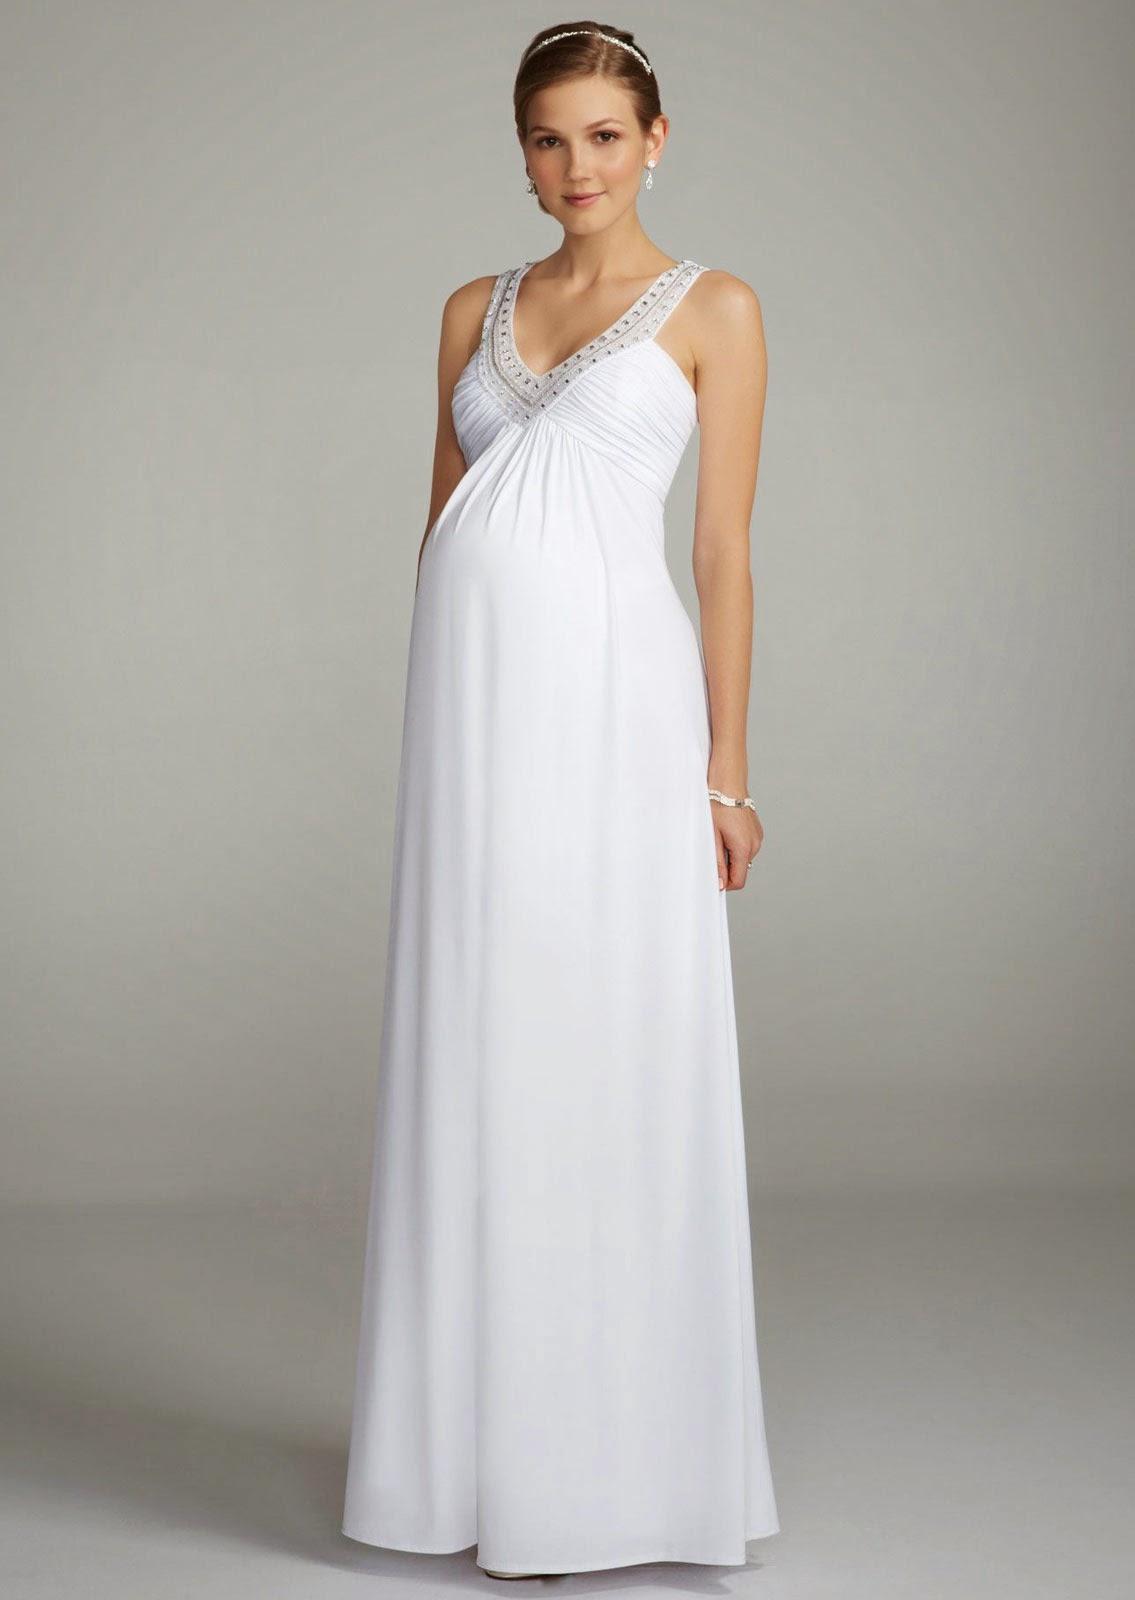 affordable maternity wedding dresses photo - 1